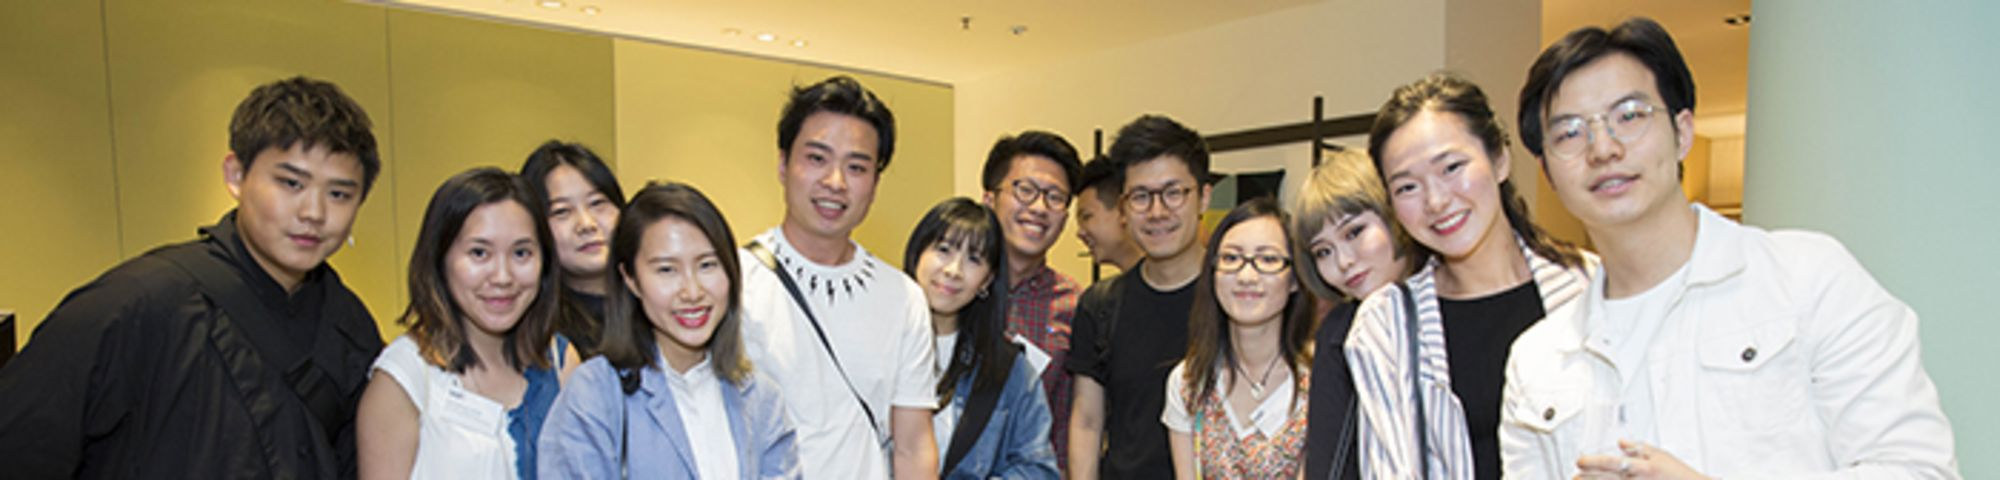 Hong Kong Alumni Recepton 2018 (3)